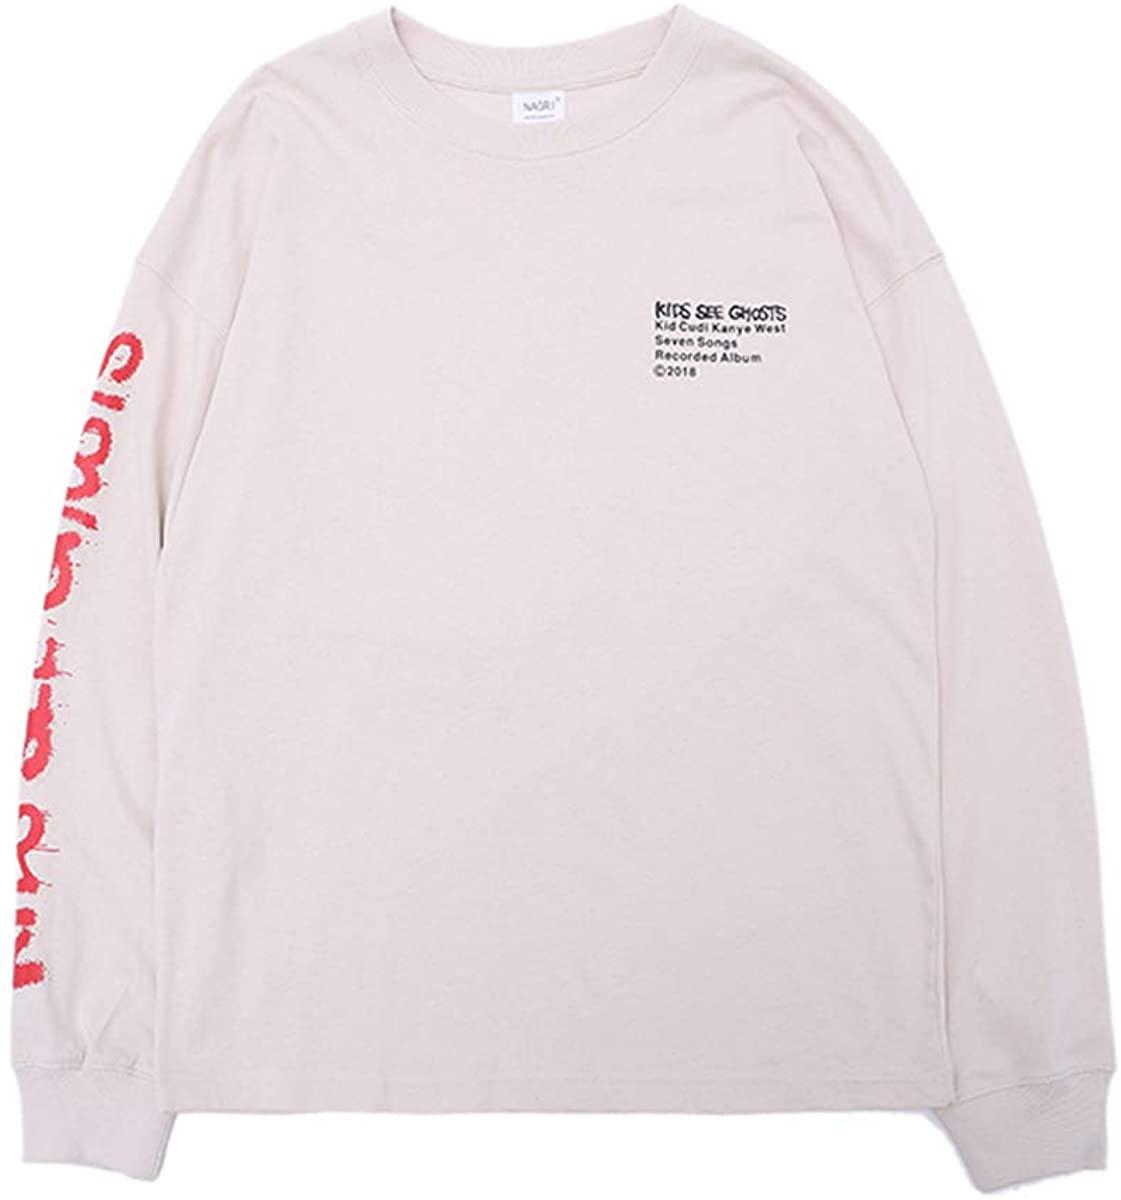 Kids See Ghosts Sweatshirt Hip Hop Graphic Sweatshirts Trendy Print Letter Cotton Crewneck Sweatshirt Hoodies